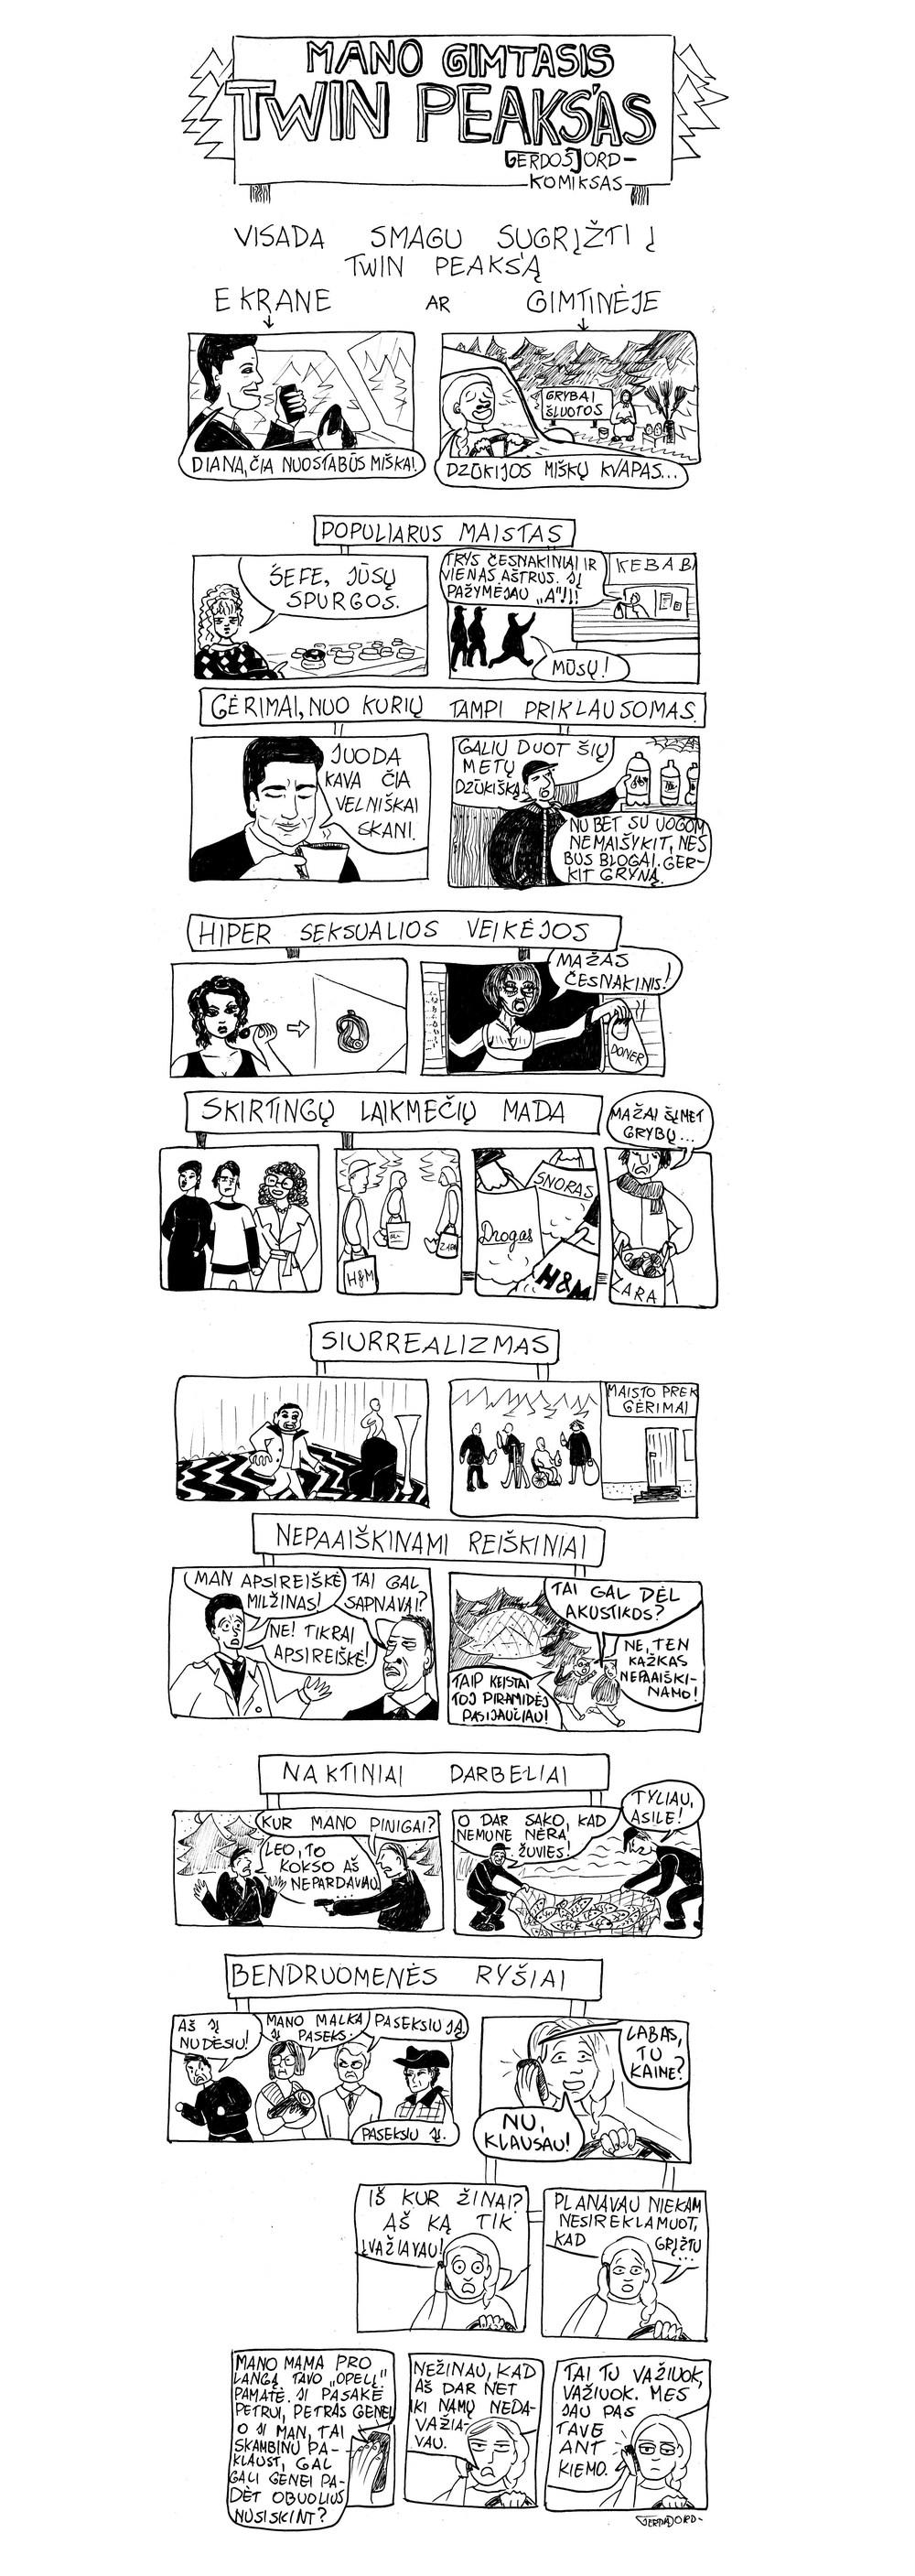 komiksas_tvin_pyksas_twin_peaks_gerda_jord_comics